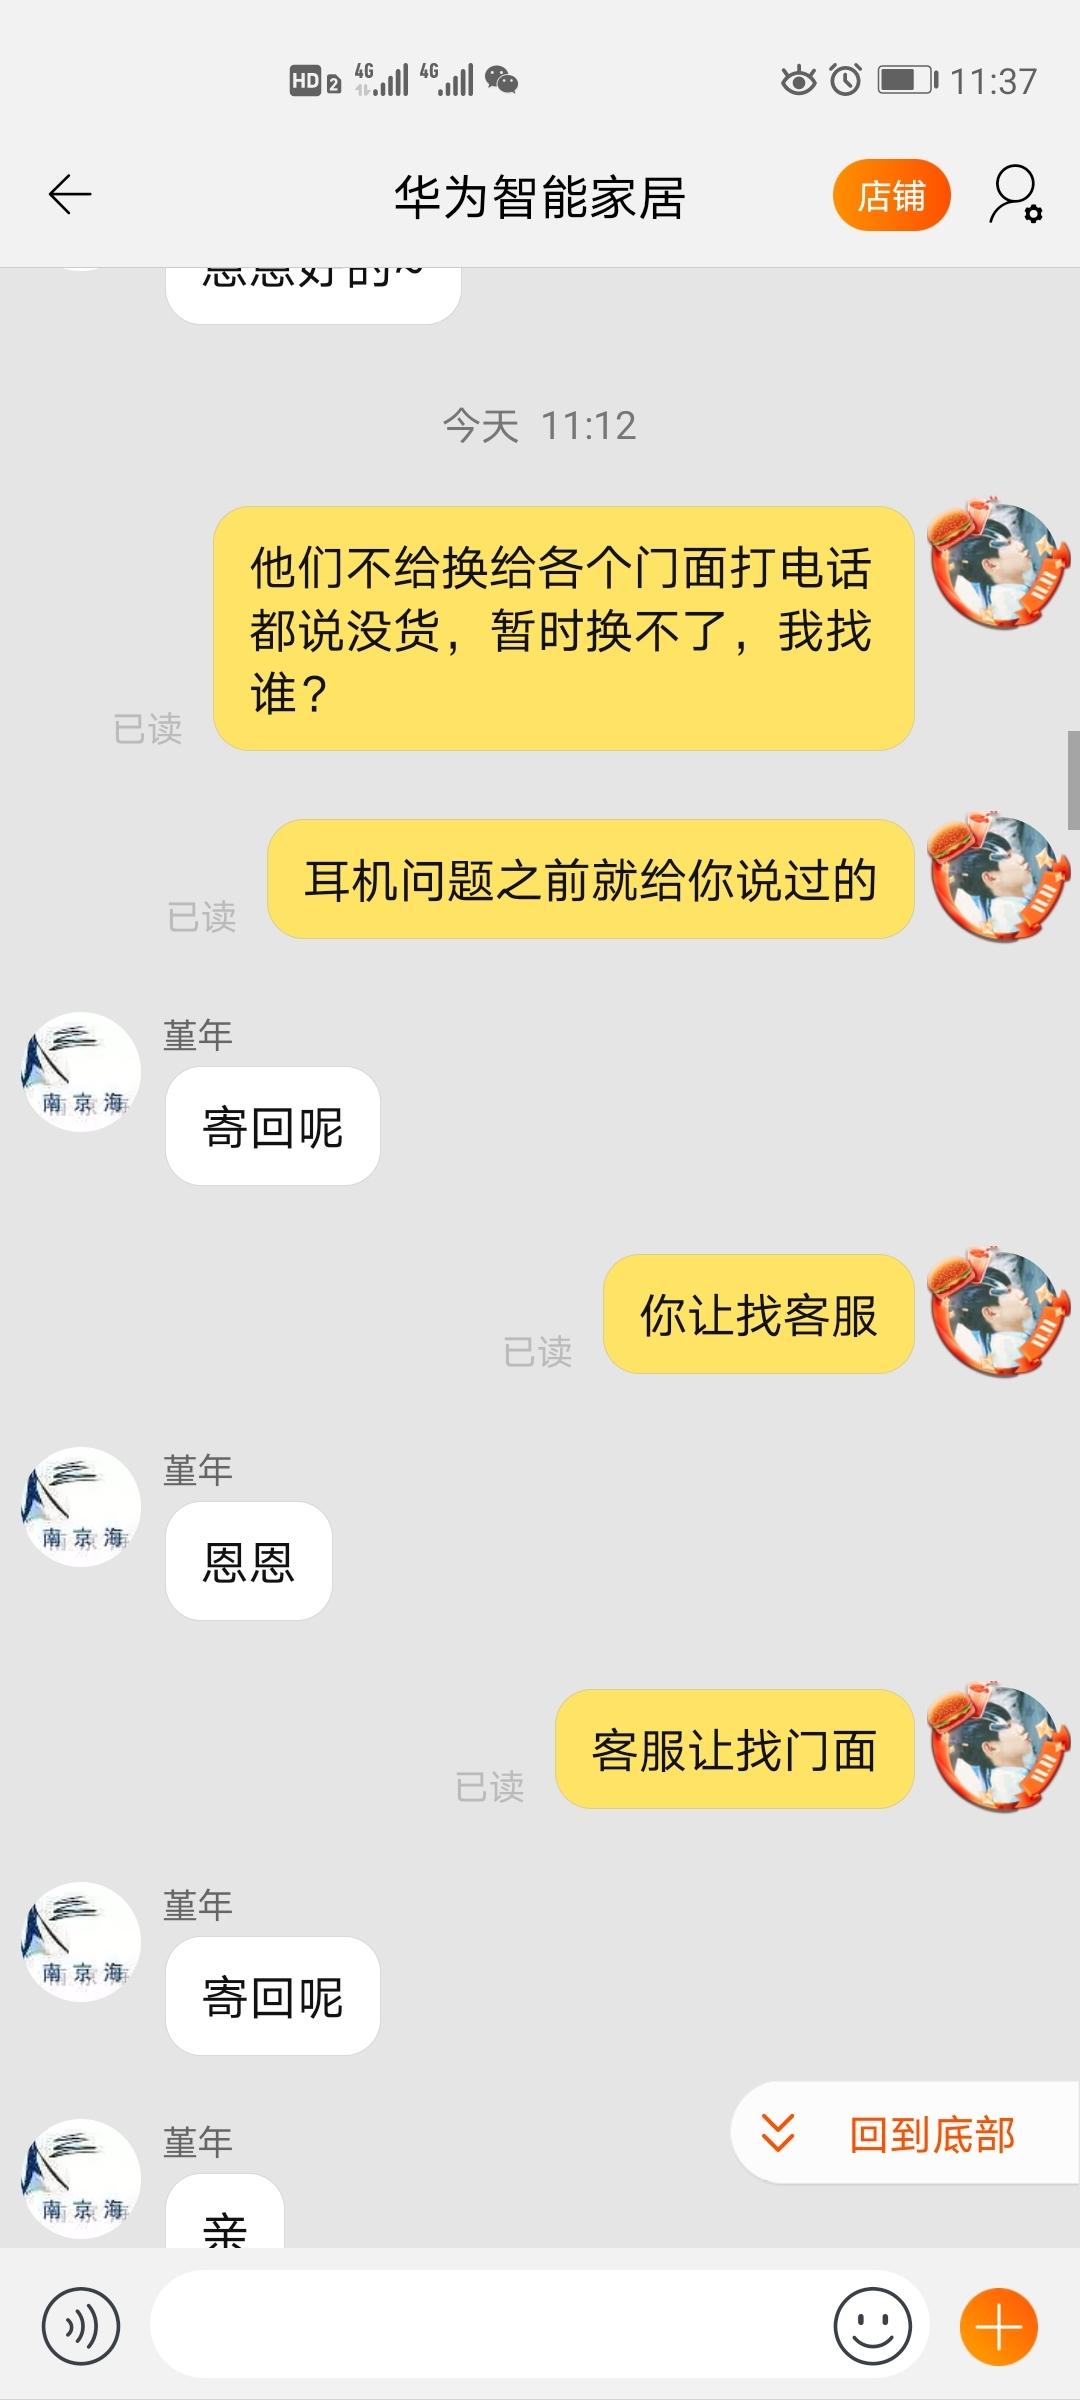 Screenshot_20200508_113729_com.taobao.taobao.jpg